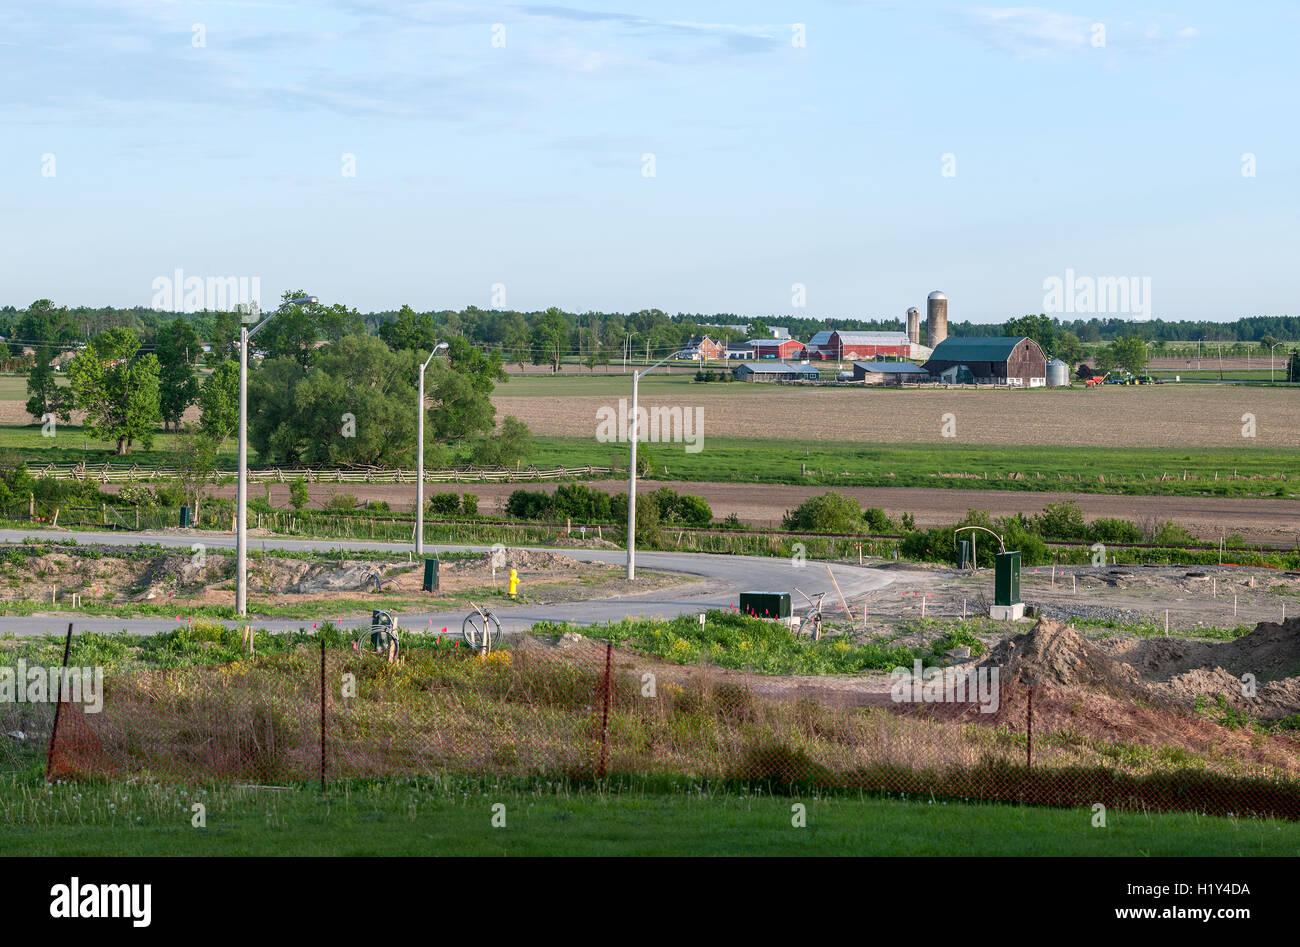 urban construction borders a farm - Stock Image